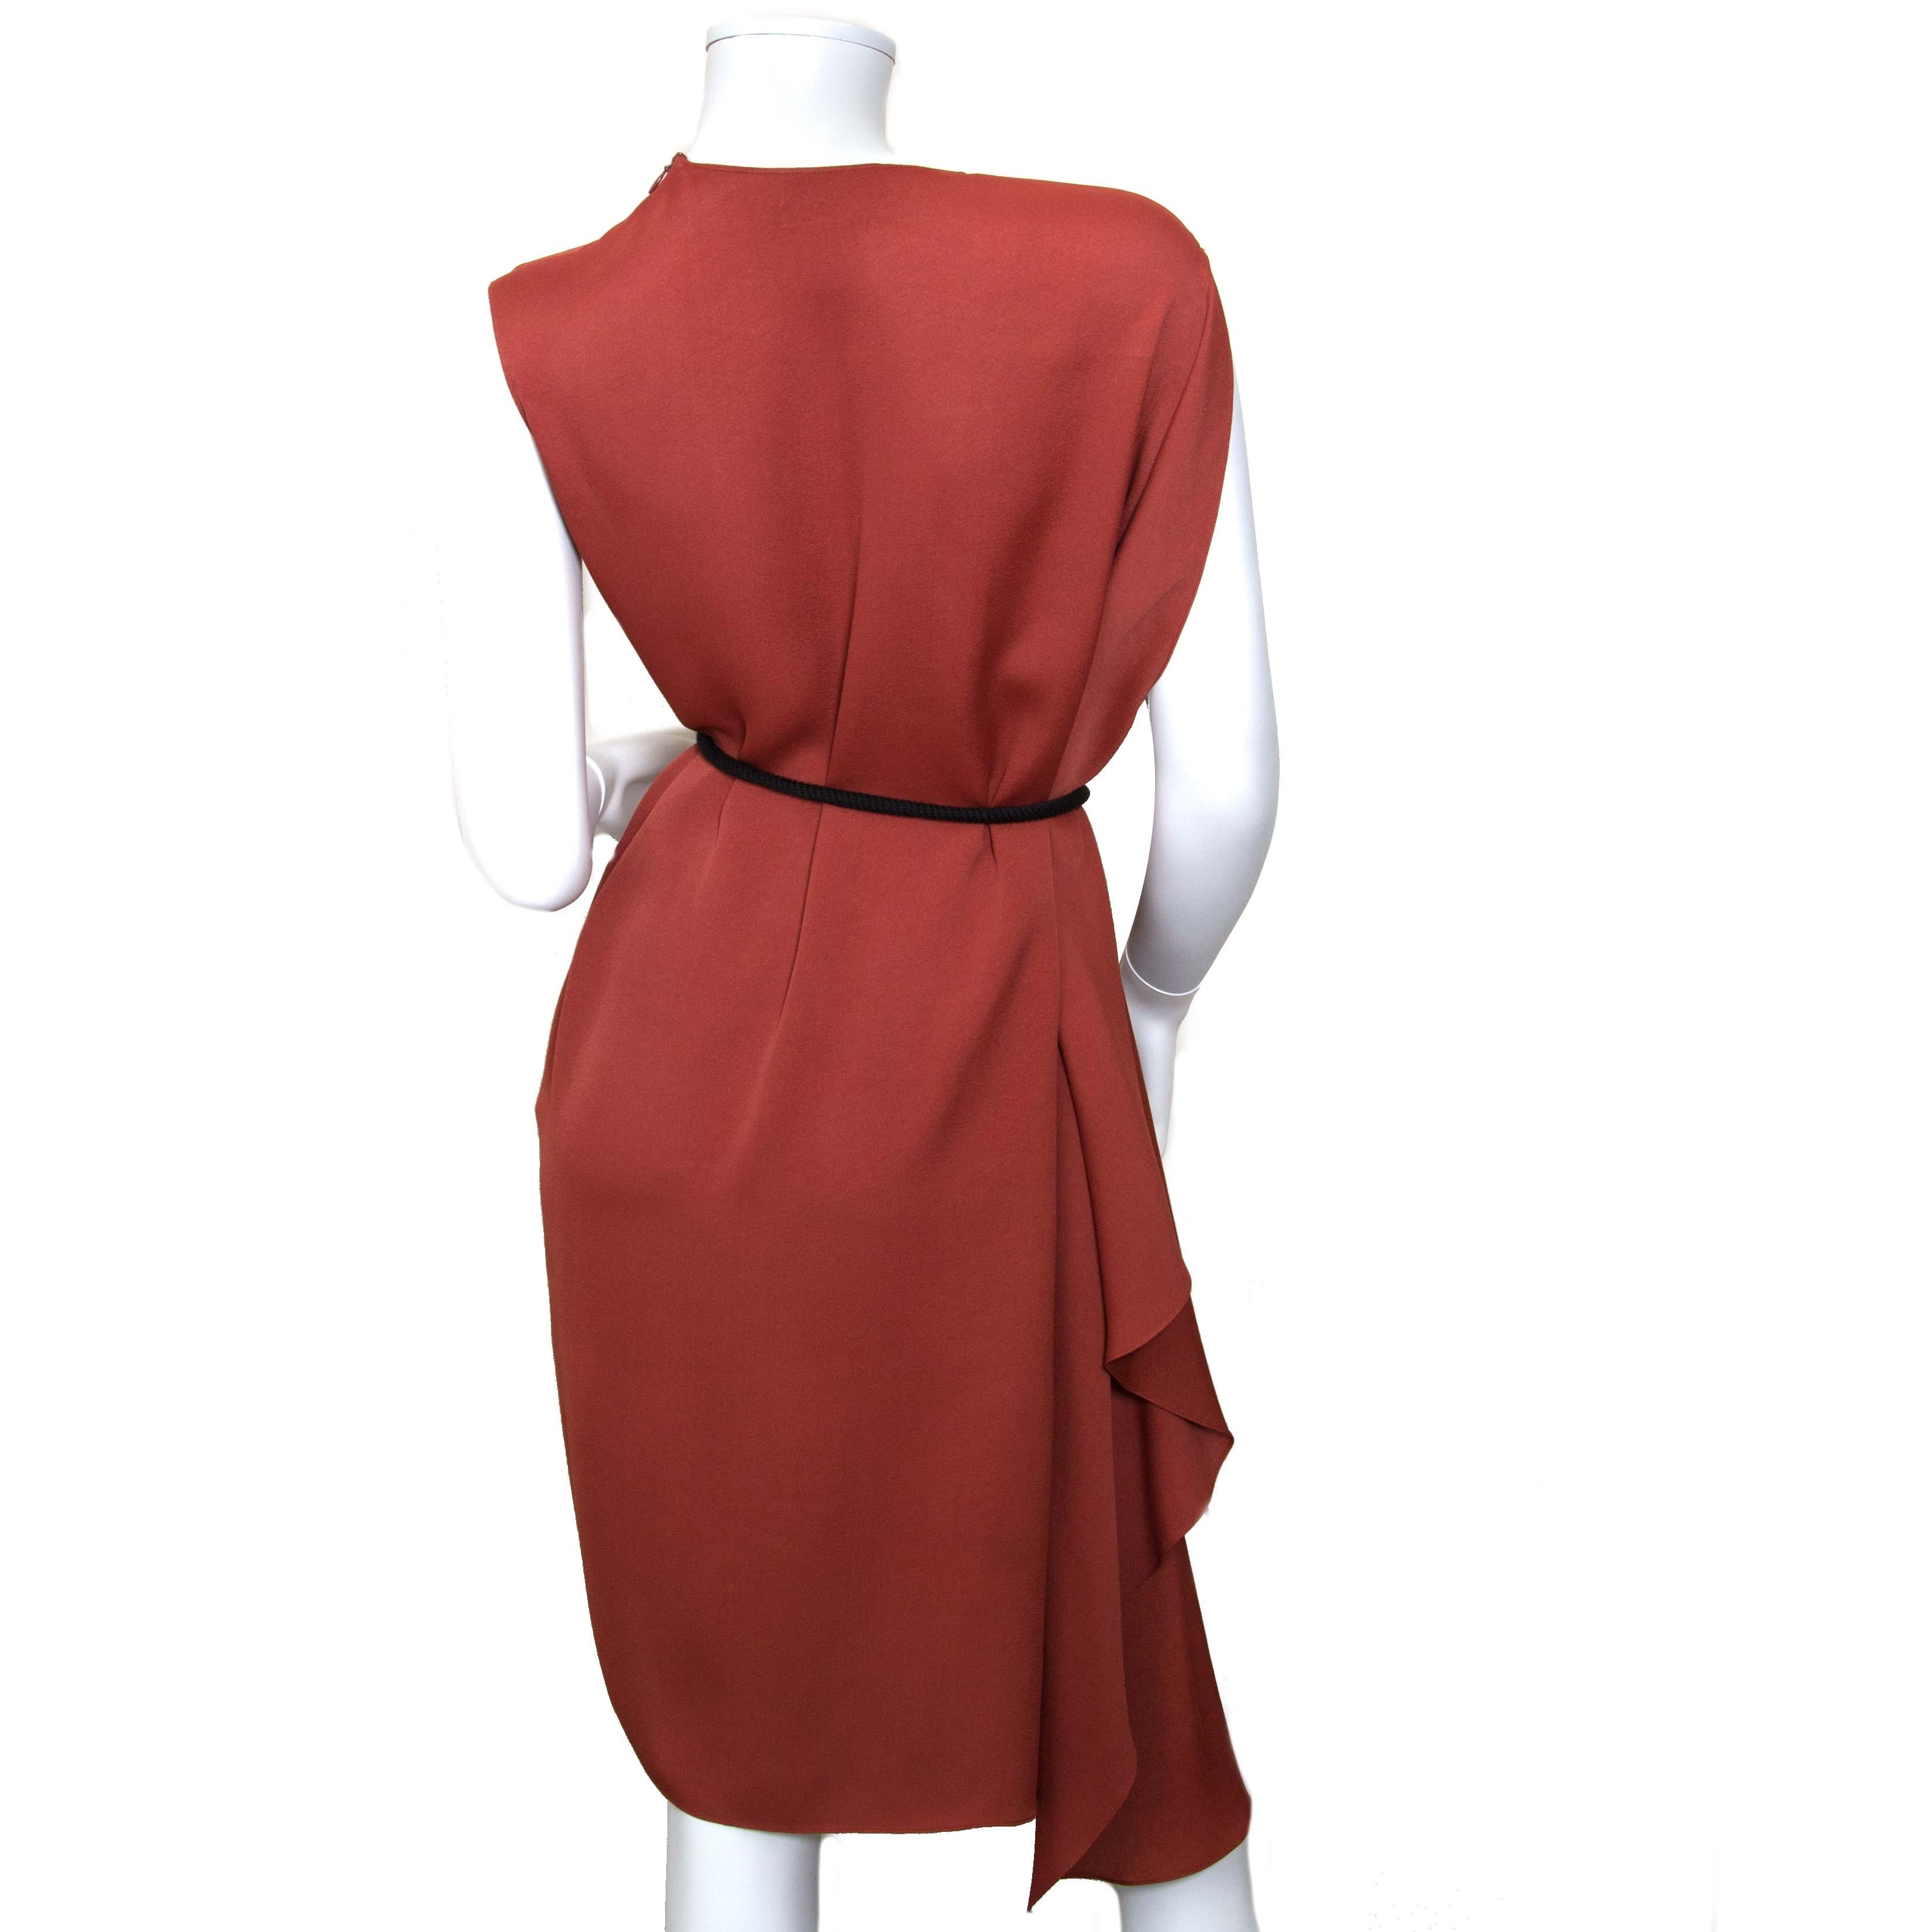 lanvin terracotta dress now for sale at labellov vintage fashion webshop belgium